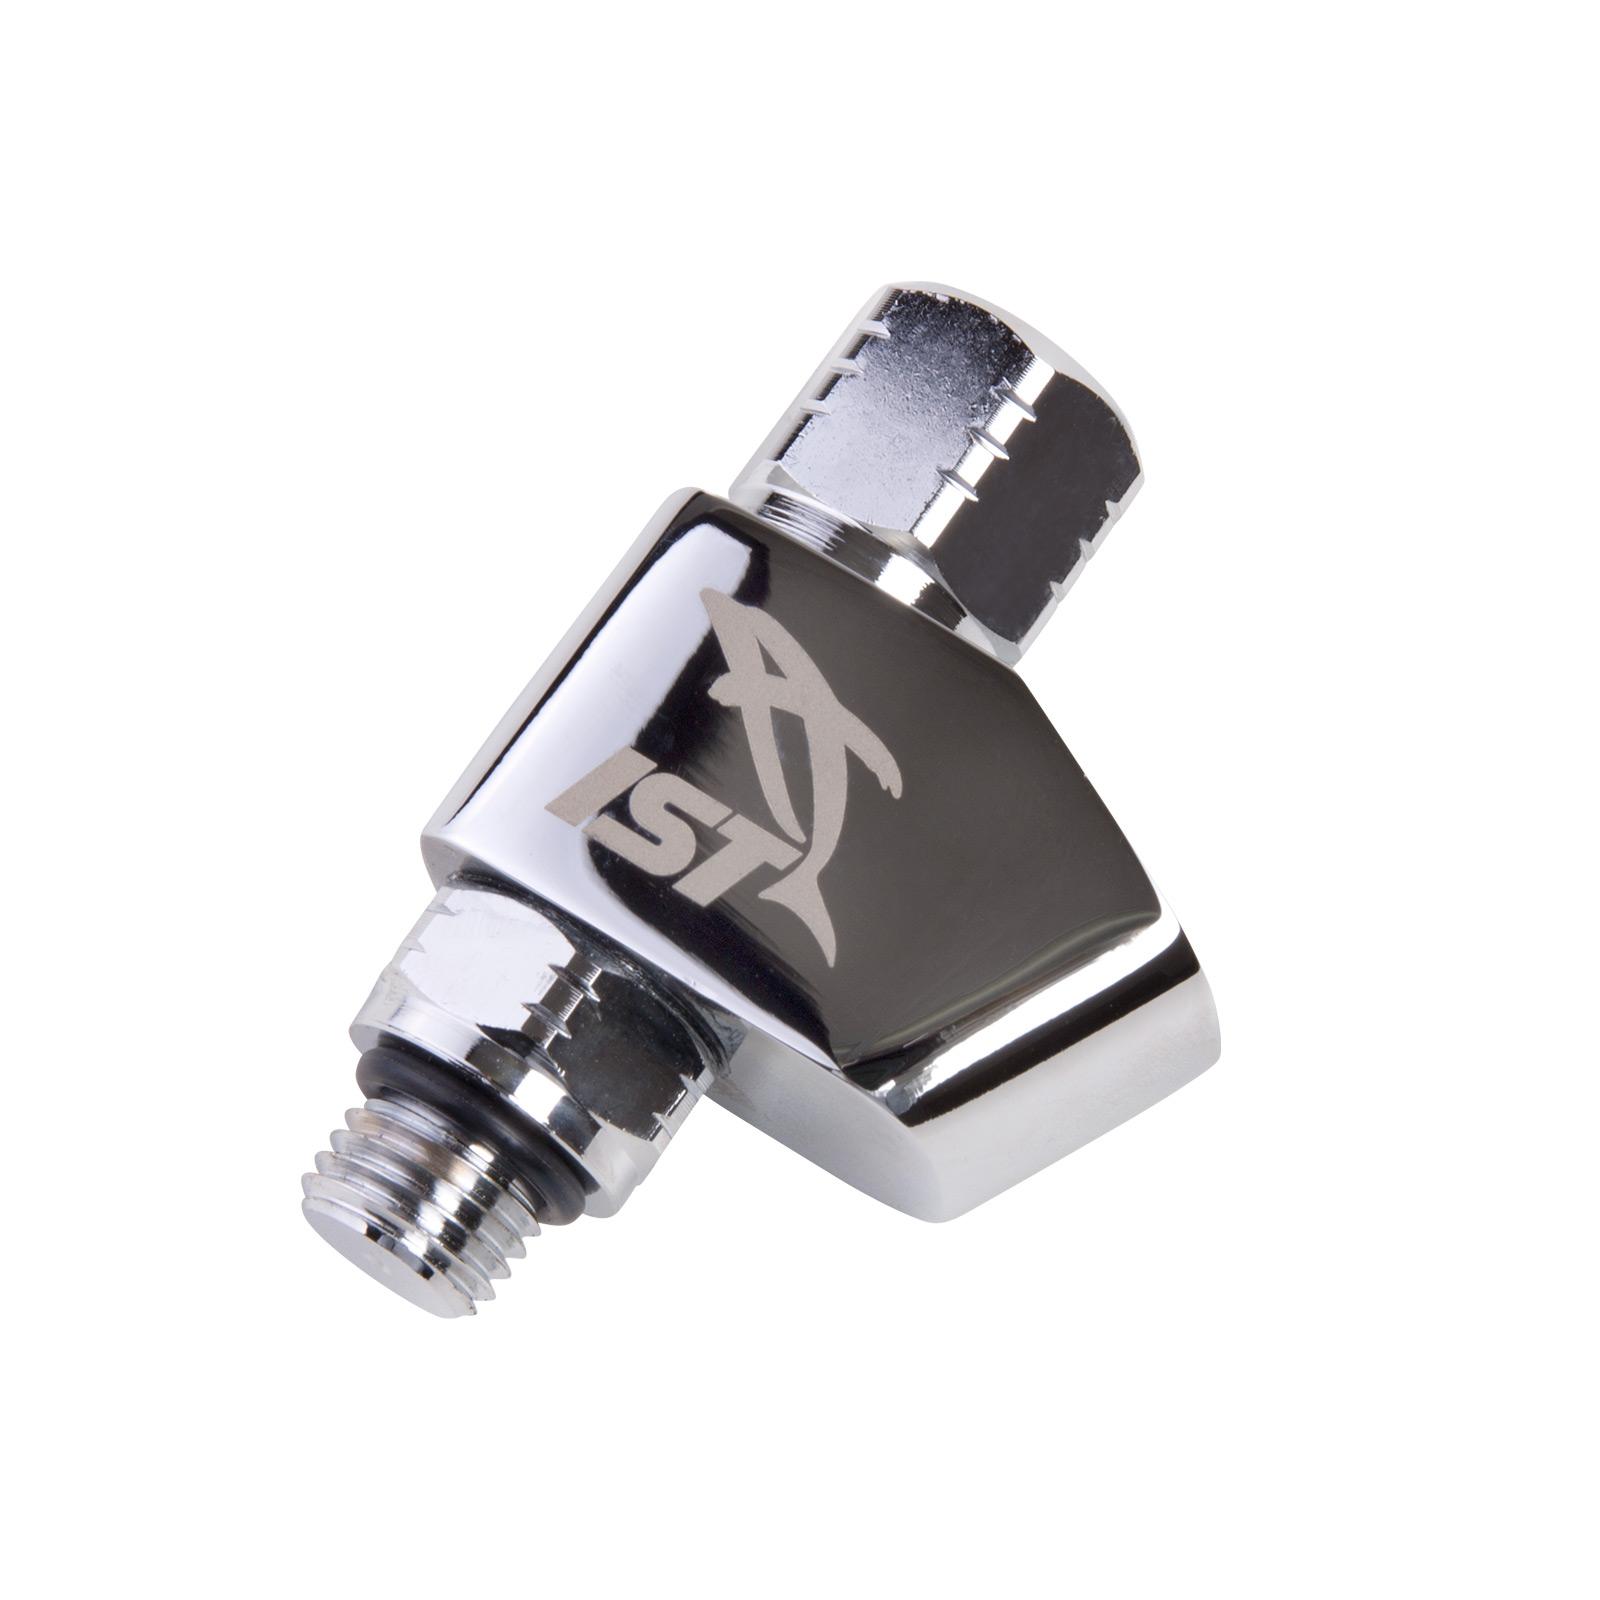 High Pressure Port Adapter